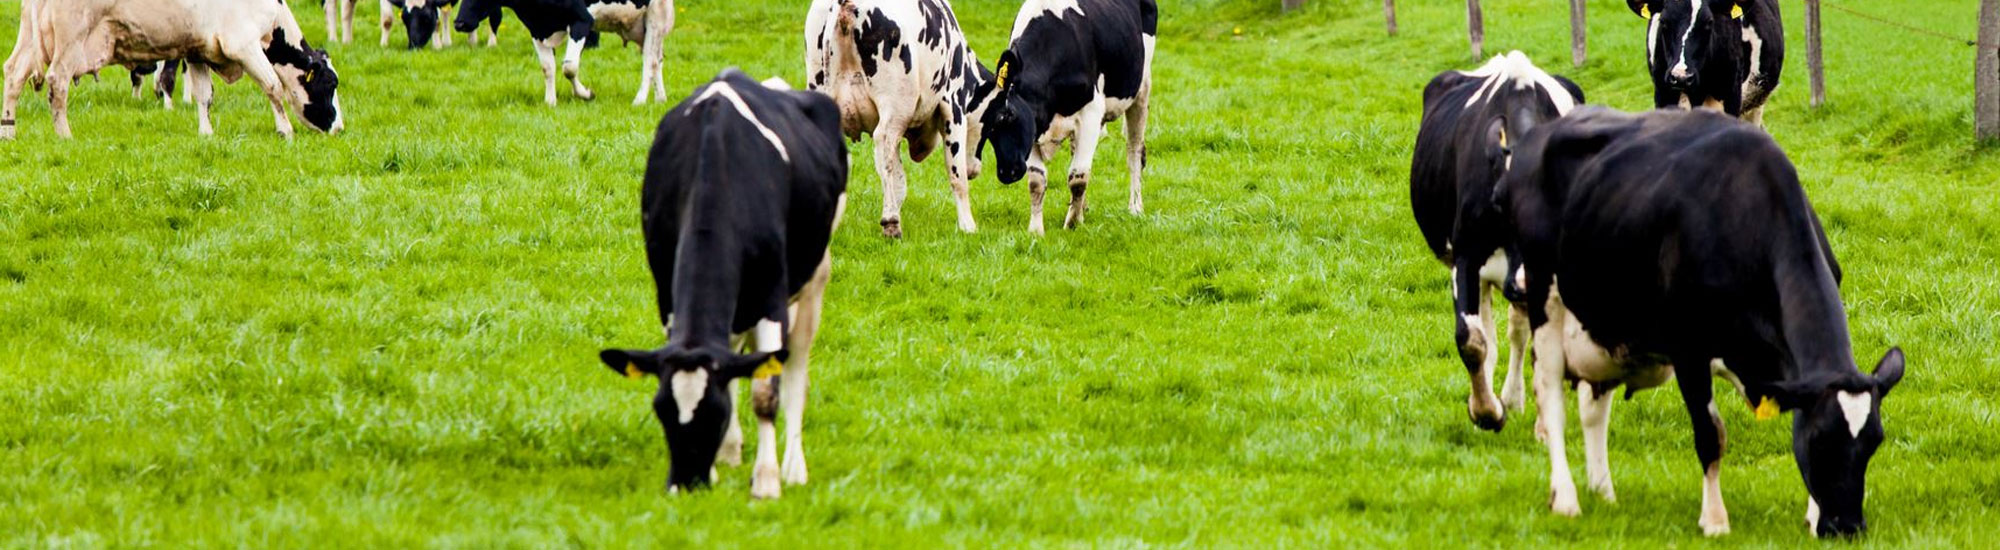 Dairy 4 Future